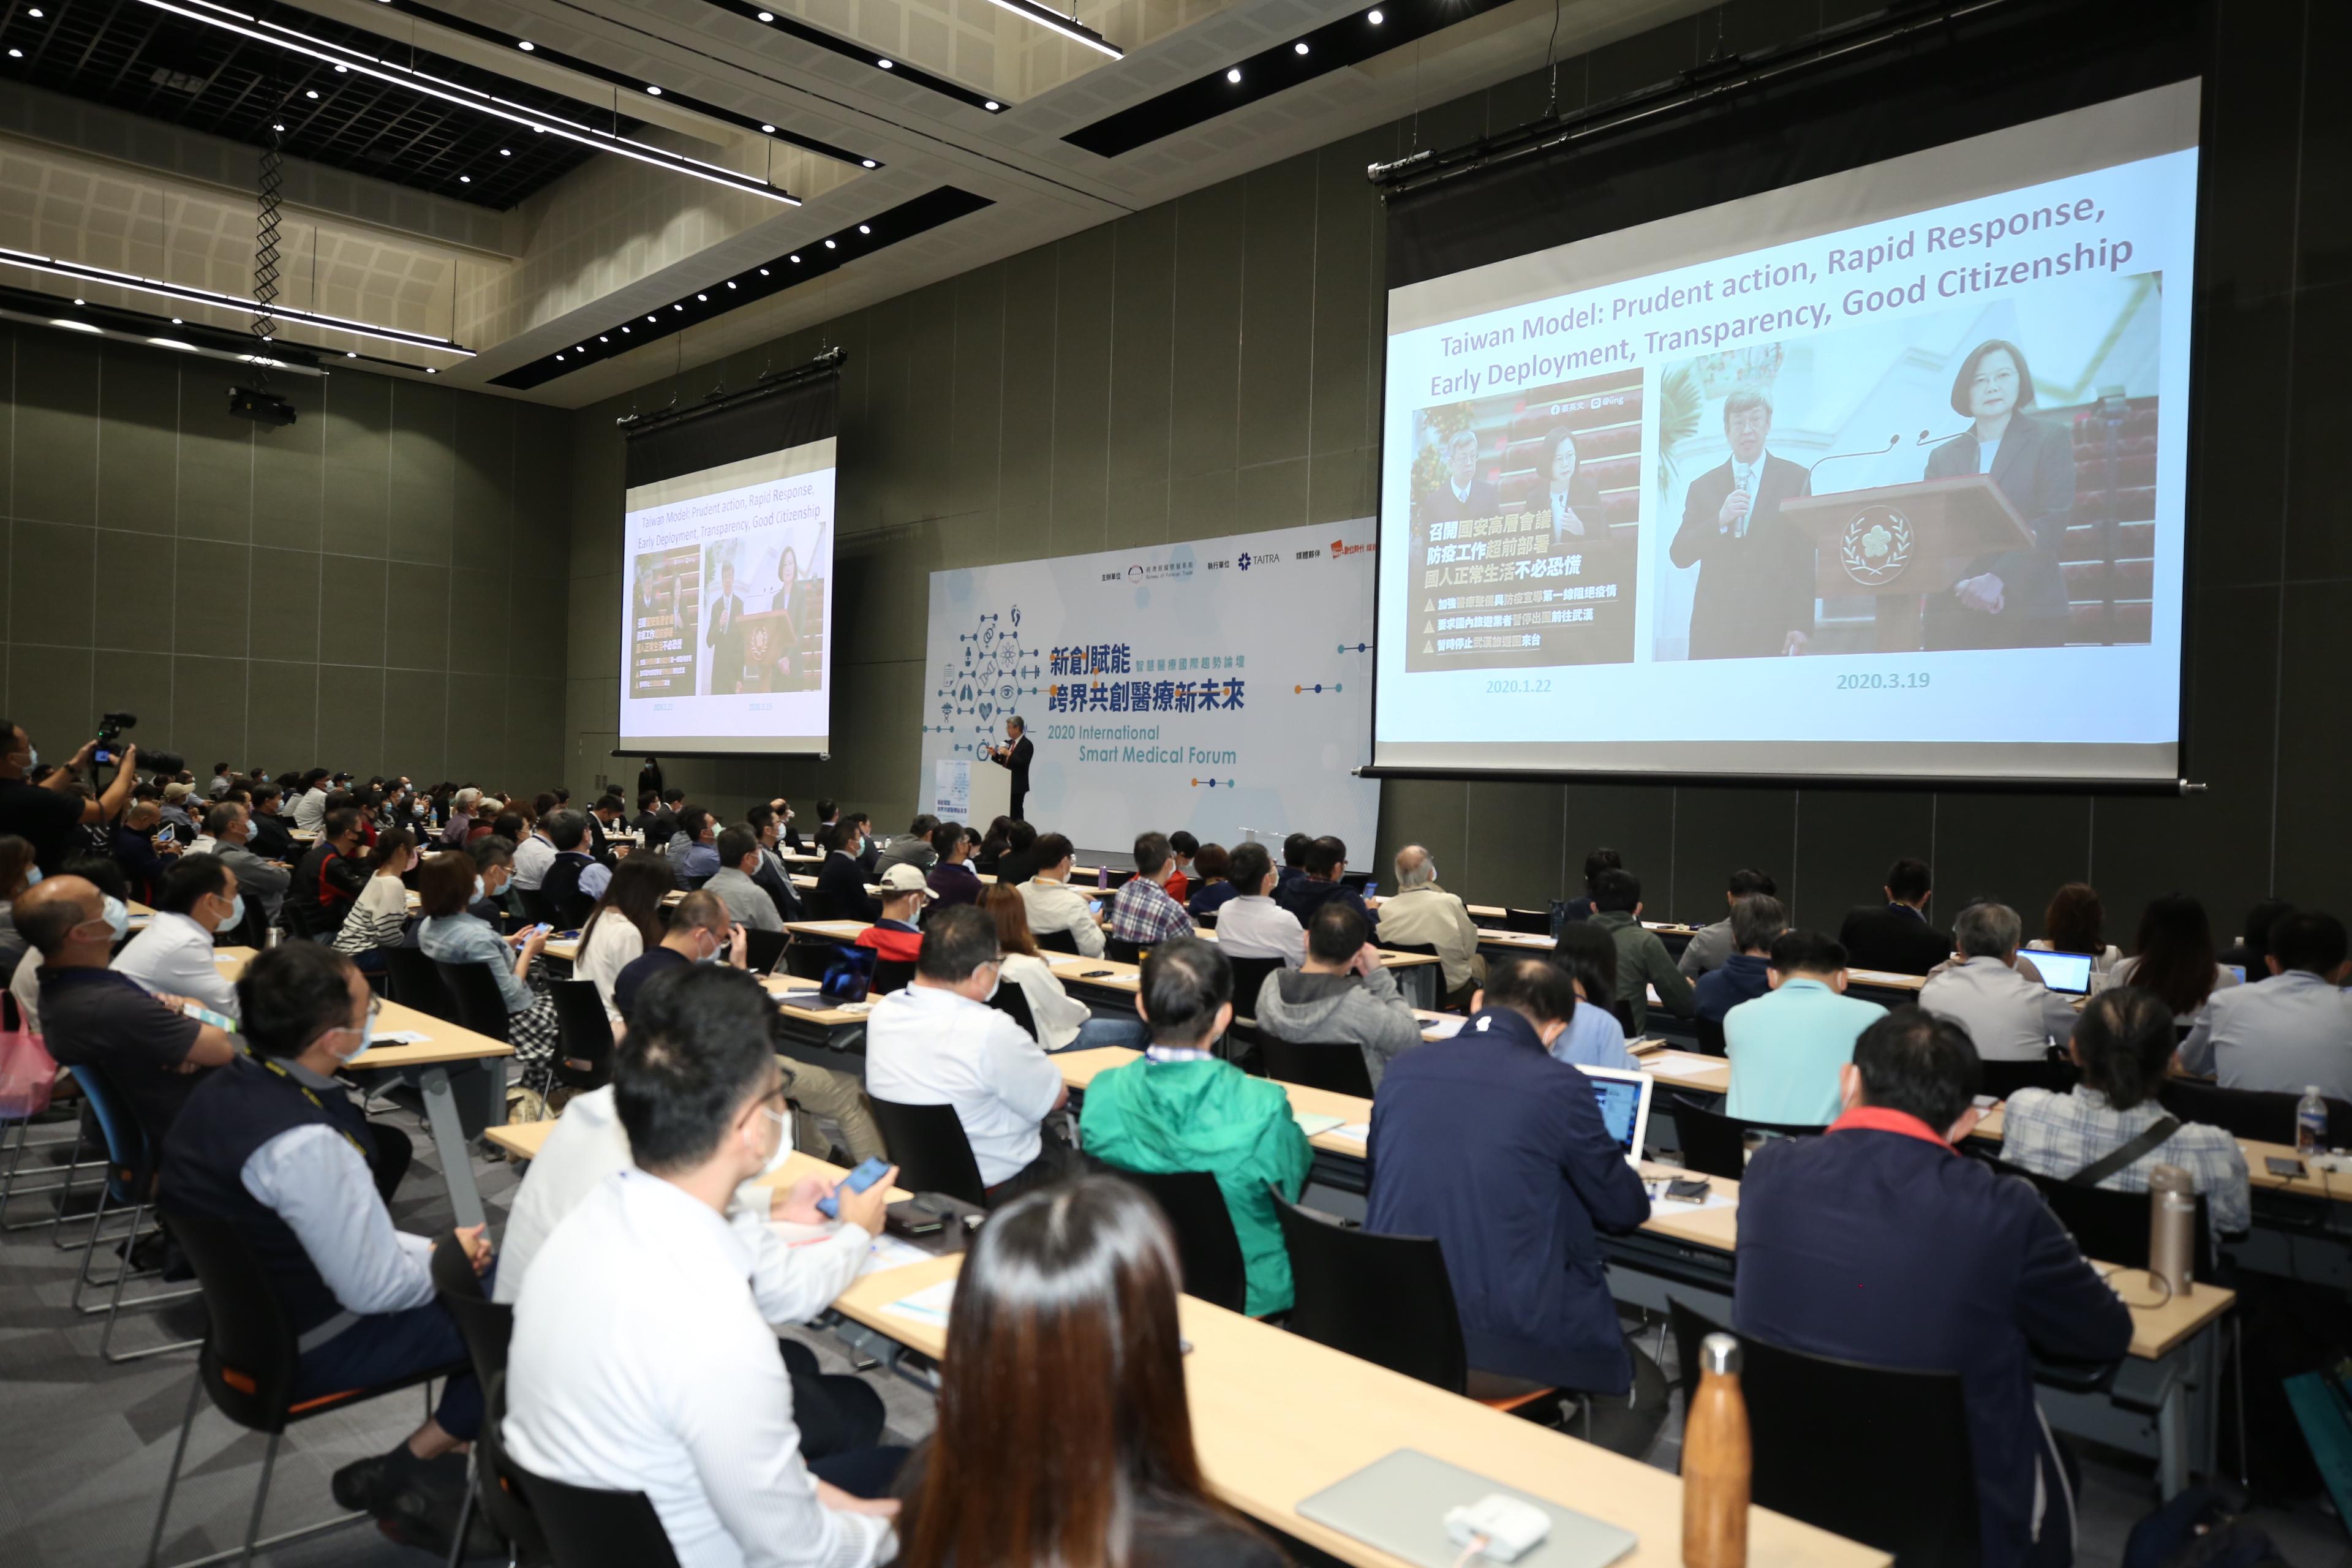 https://storage.googleapis.com/www.taiwantradeshow.com.tw/activity-photo/202011/T-00107265-name.jpg